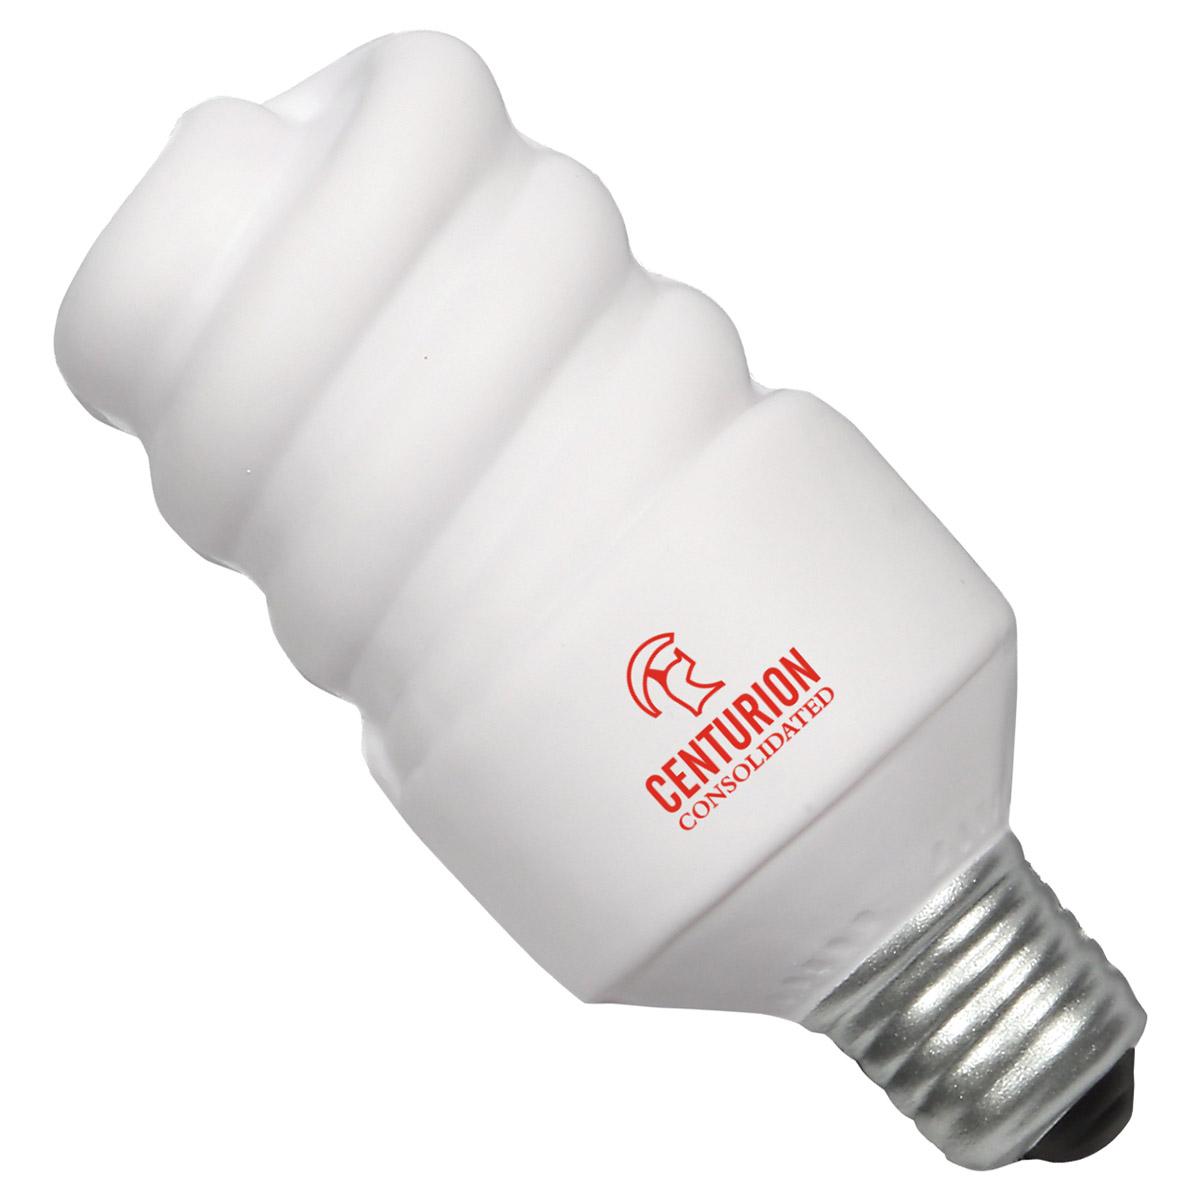 Mini Energy Saving Lightbulb Stress Reliever, LEL-ML10, 1 Colour Imprint